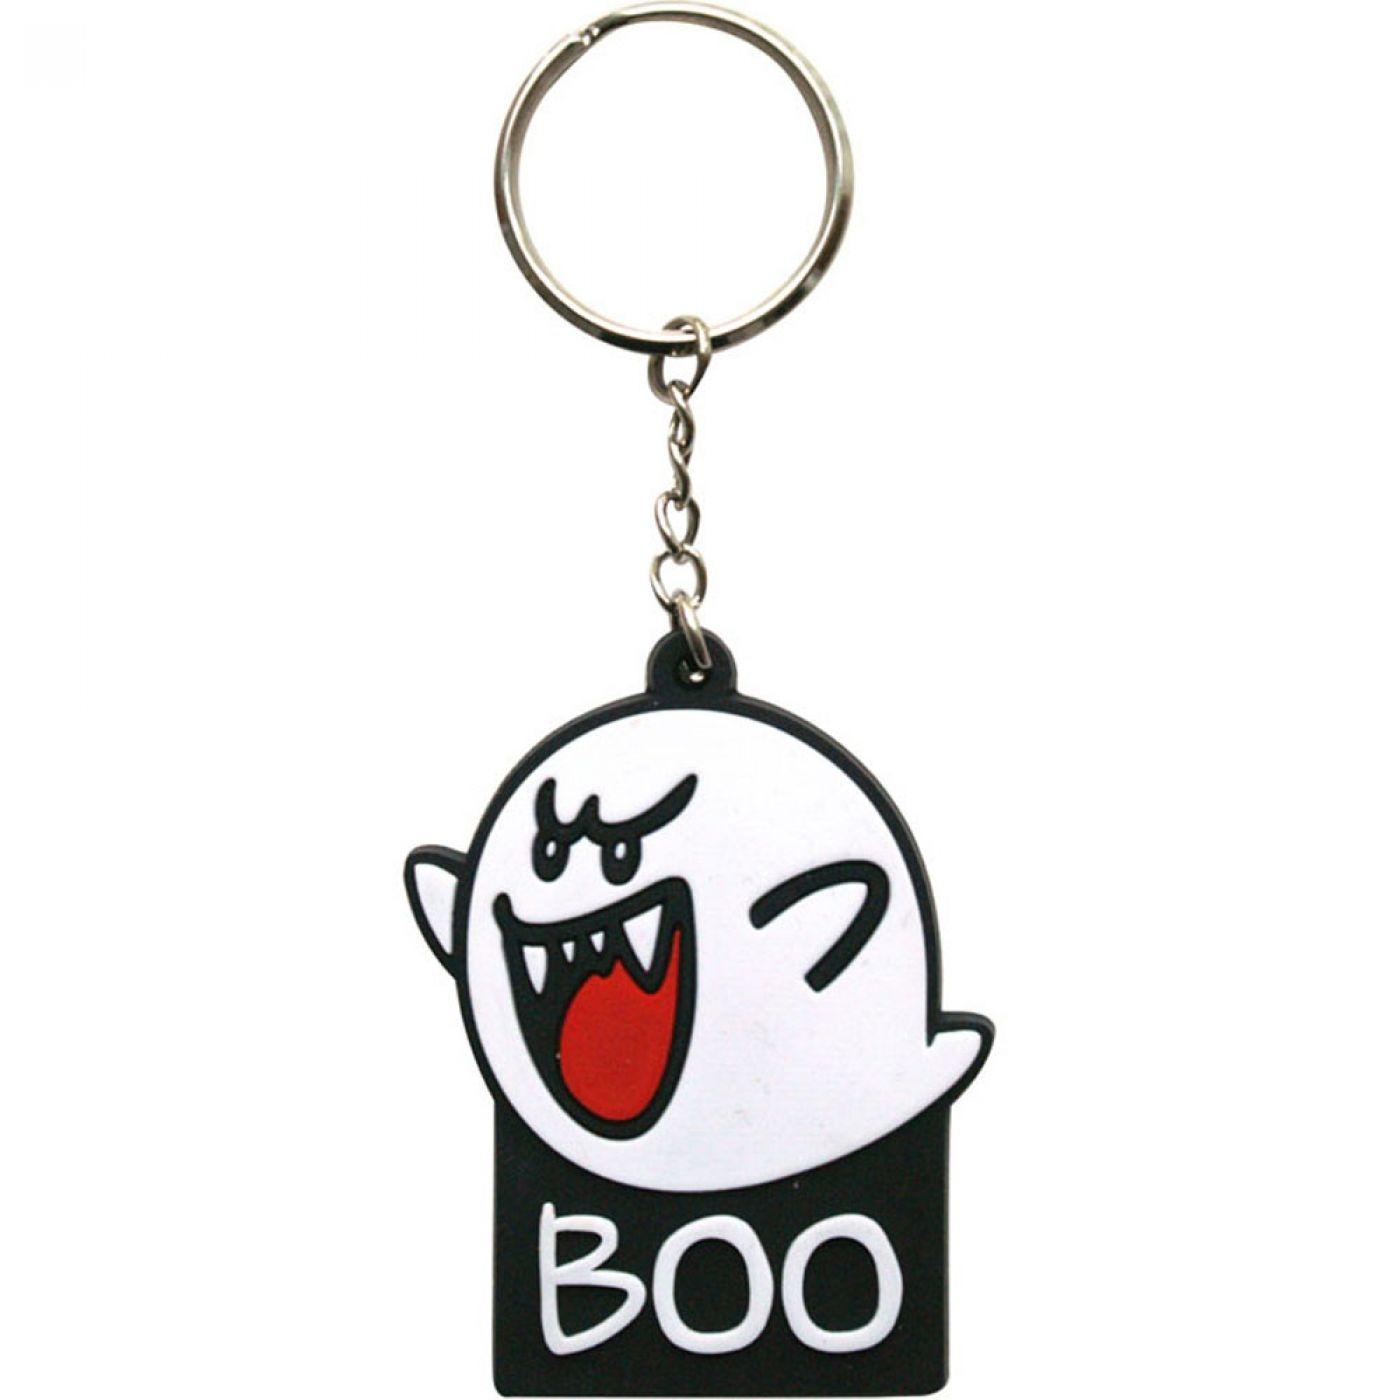 Nintendo Super Mario Bros Boo keychain